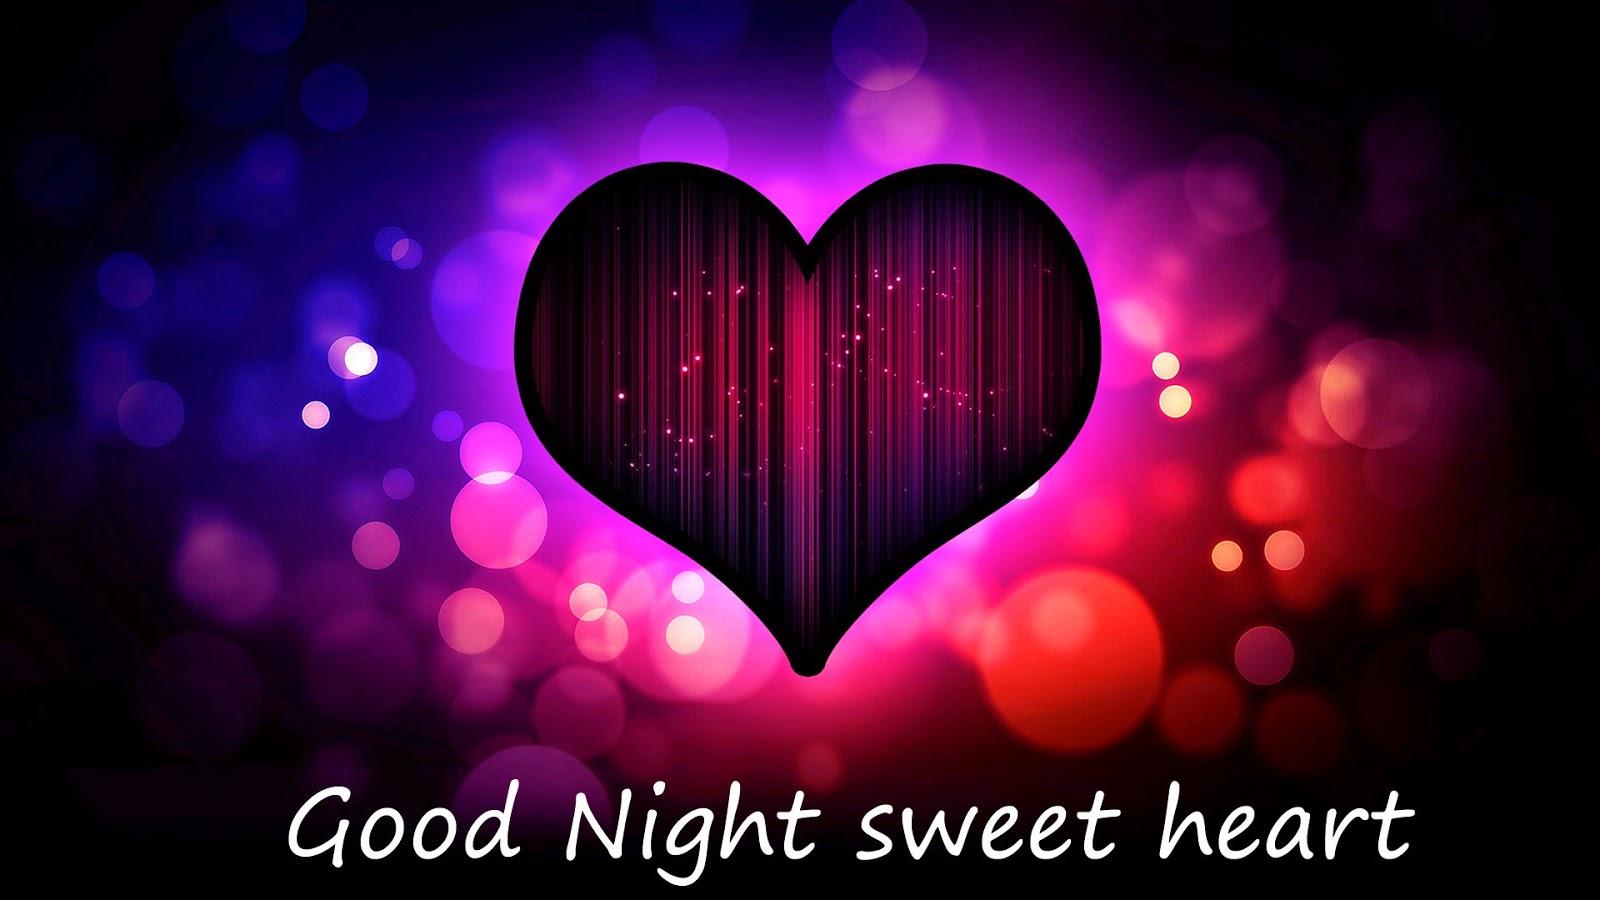 Wallpaper download good night - Good Night Photos Download Freedownload